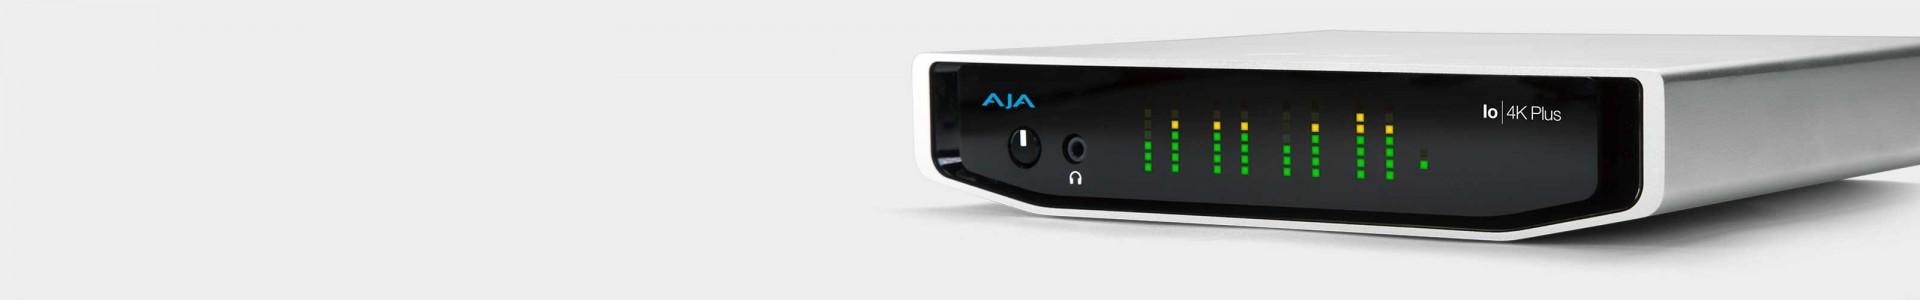 Professional external video Capture Devices - Avacab